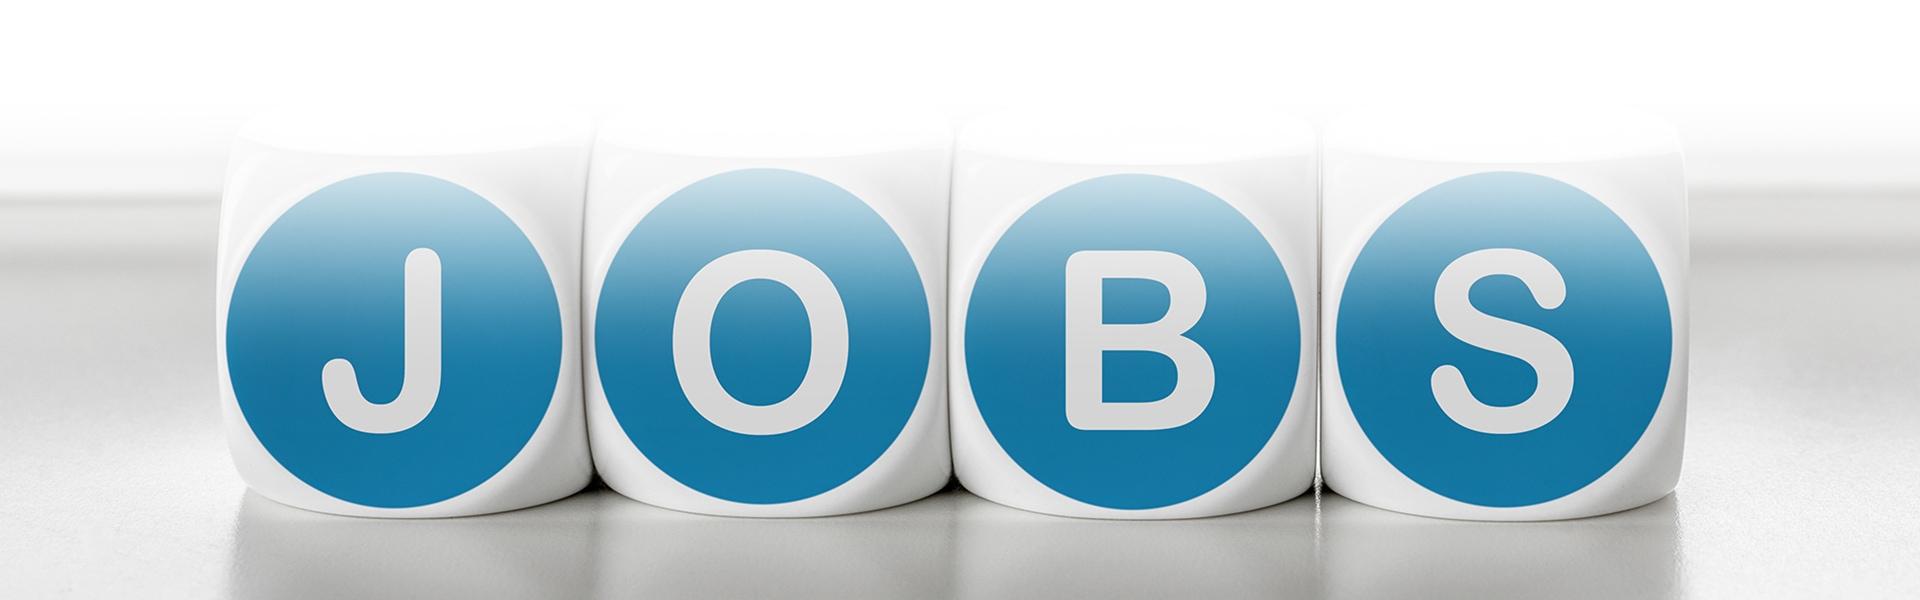 Die Firma Zschunke Gmbh hat Stellenangebote